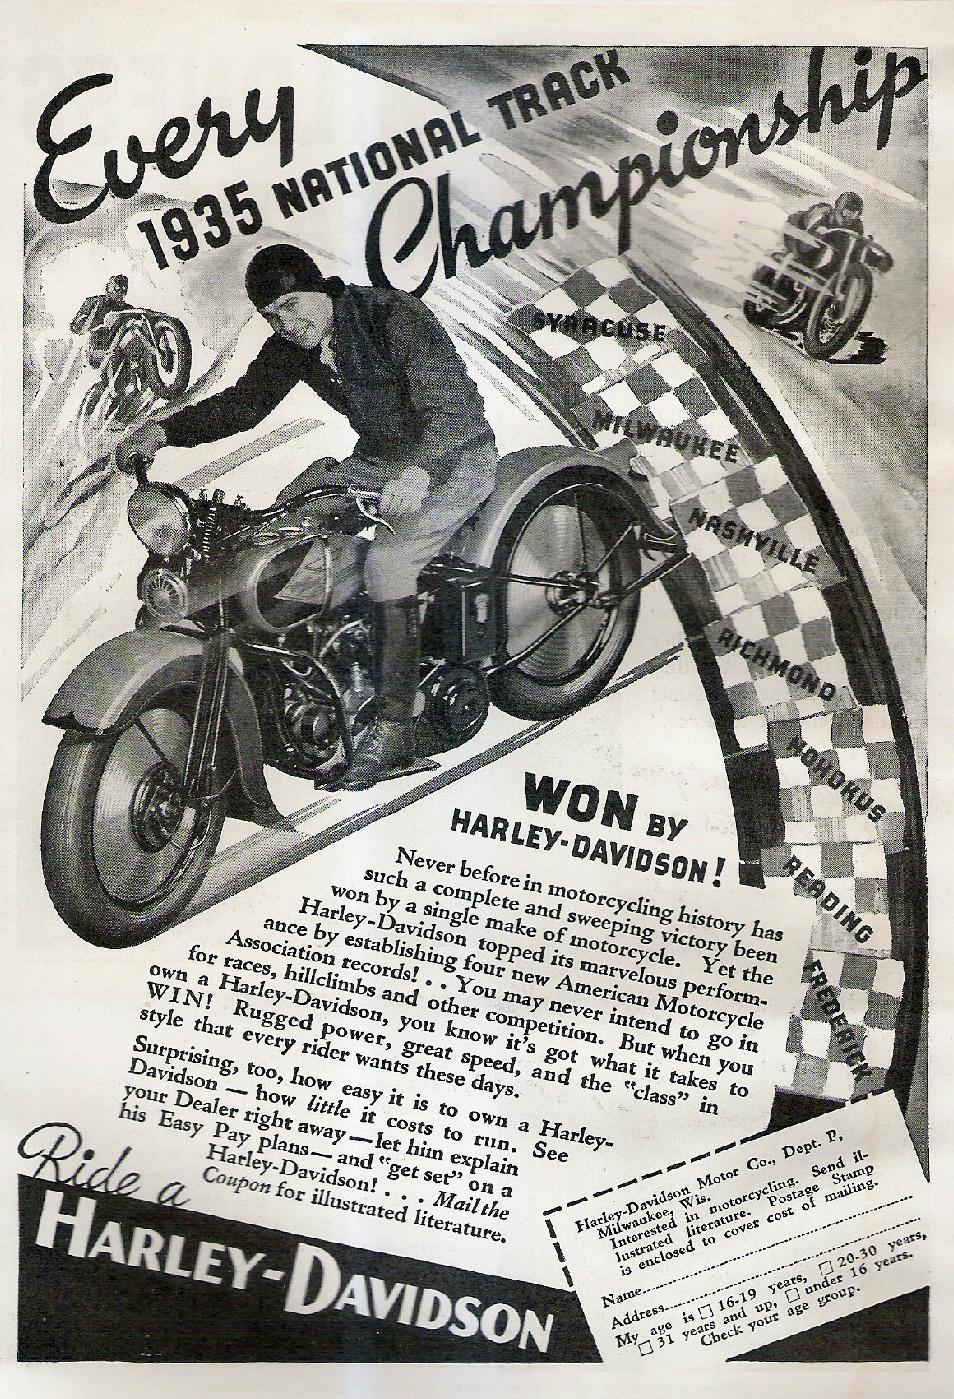 1935 National Track